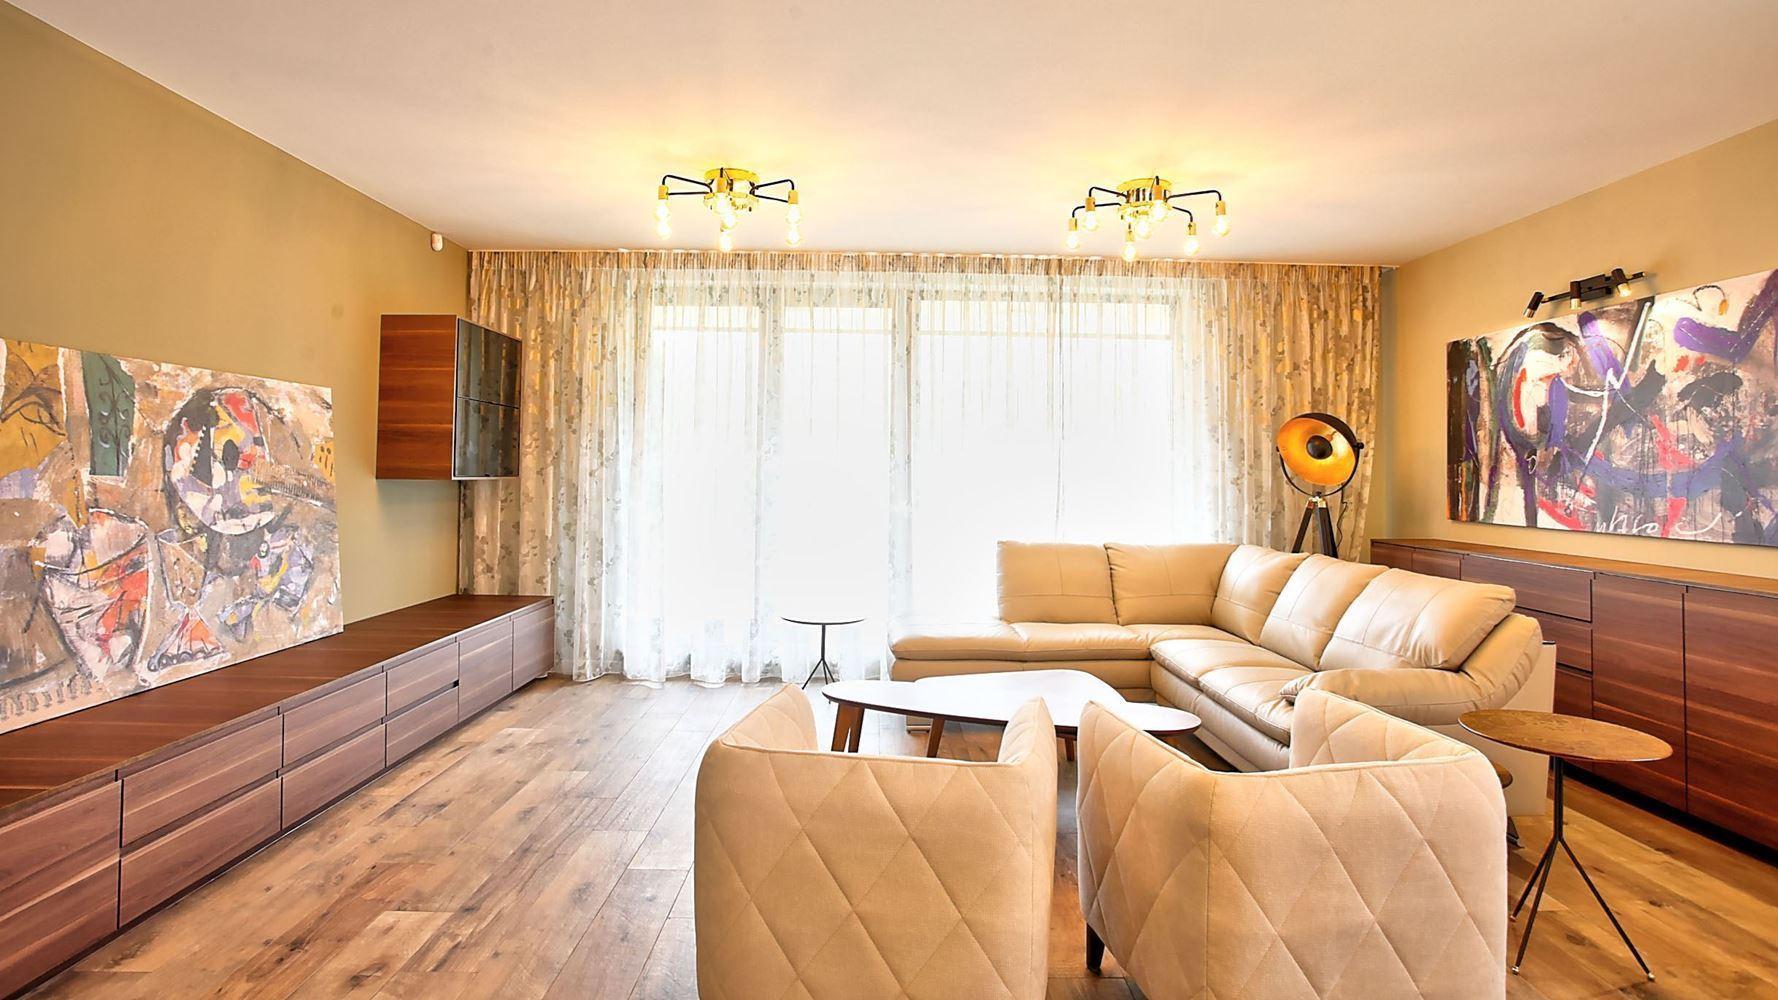 2-bedroom Apartment for Rent, Simeonovo